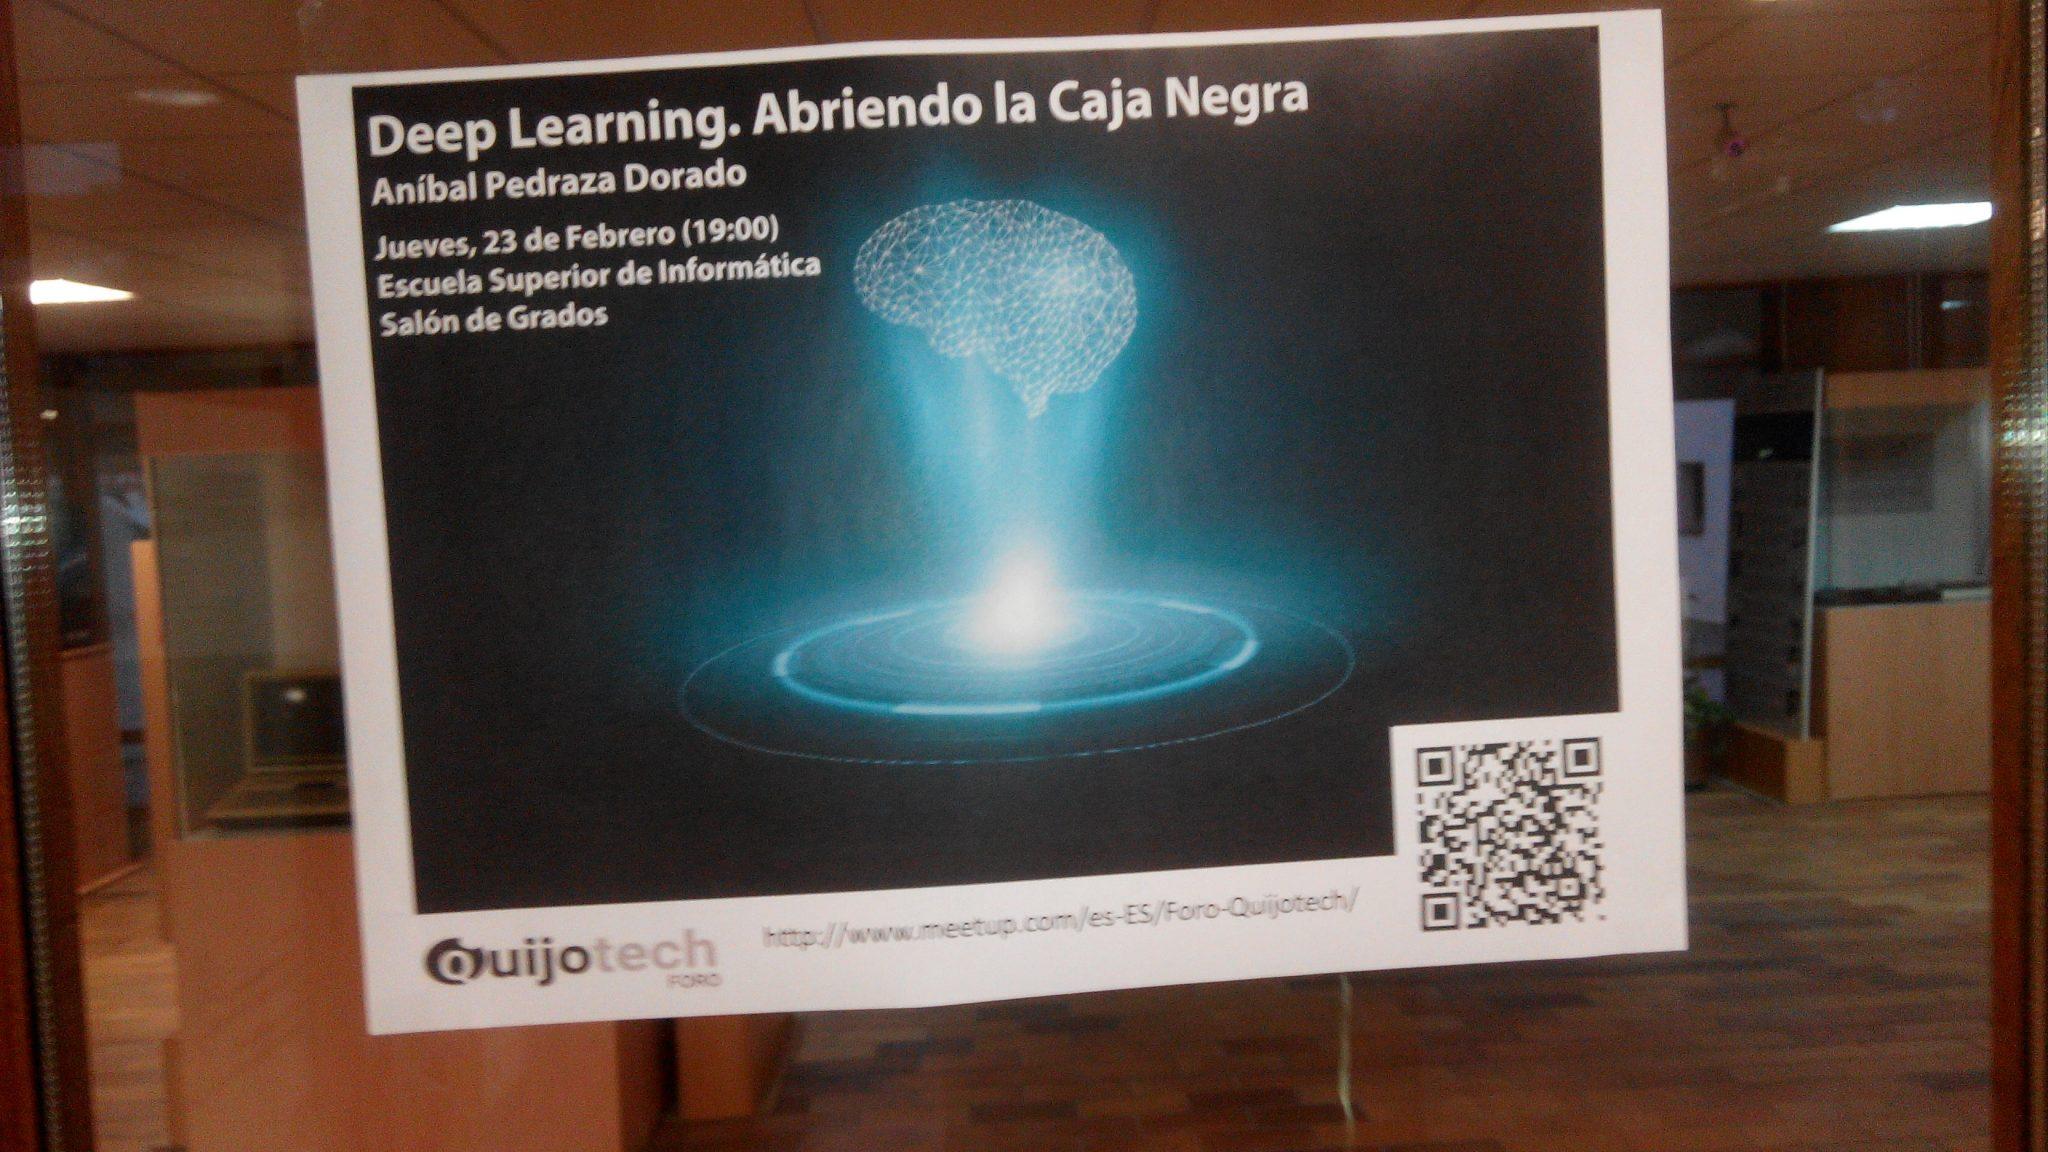 deep learning meet up febrero17 foro quijotech CR